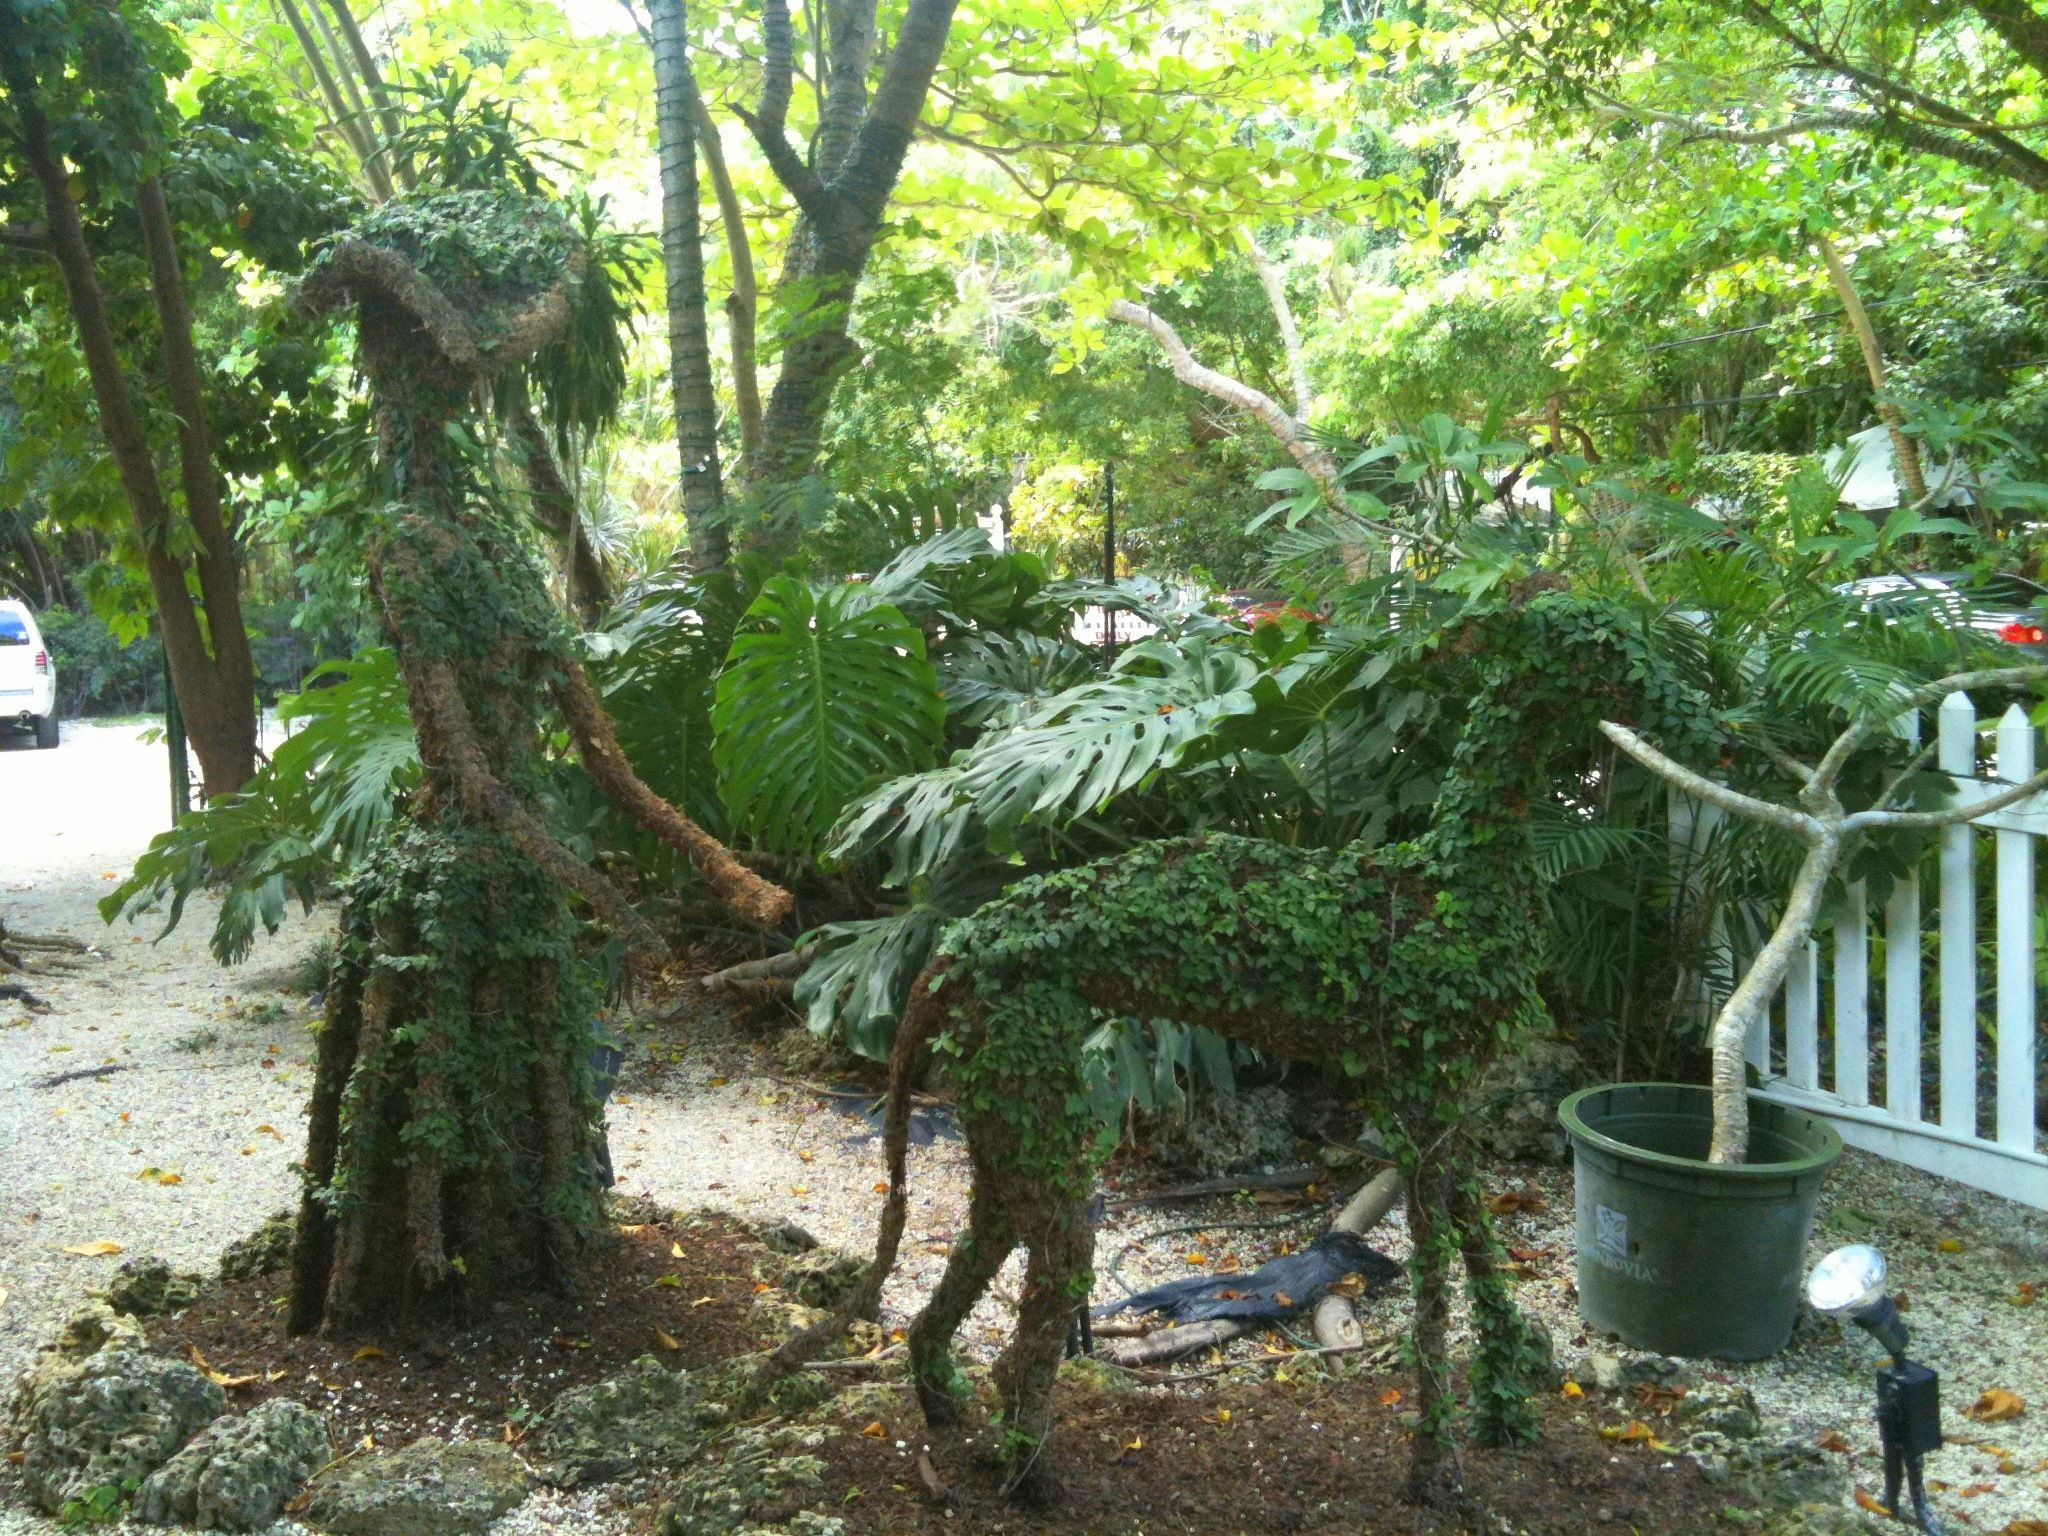 Topiary Garden Design Ideas Part - 42: Explore Backyard Landscape Design And More!